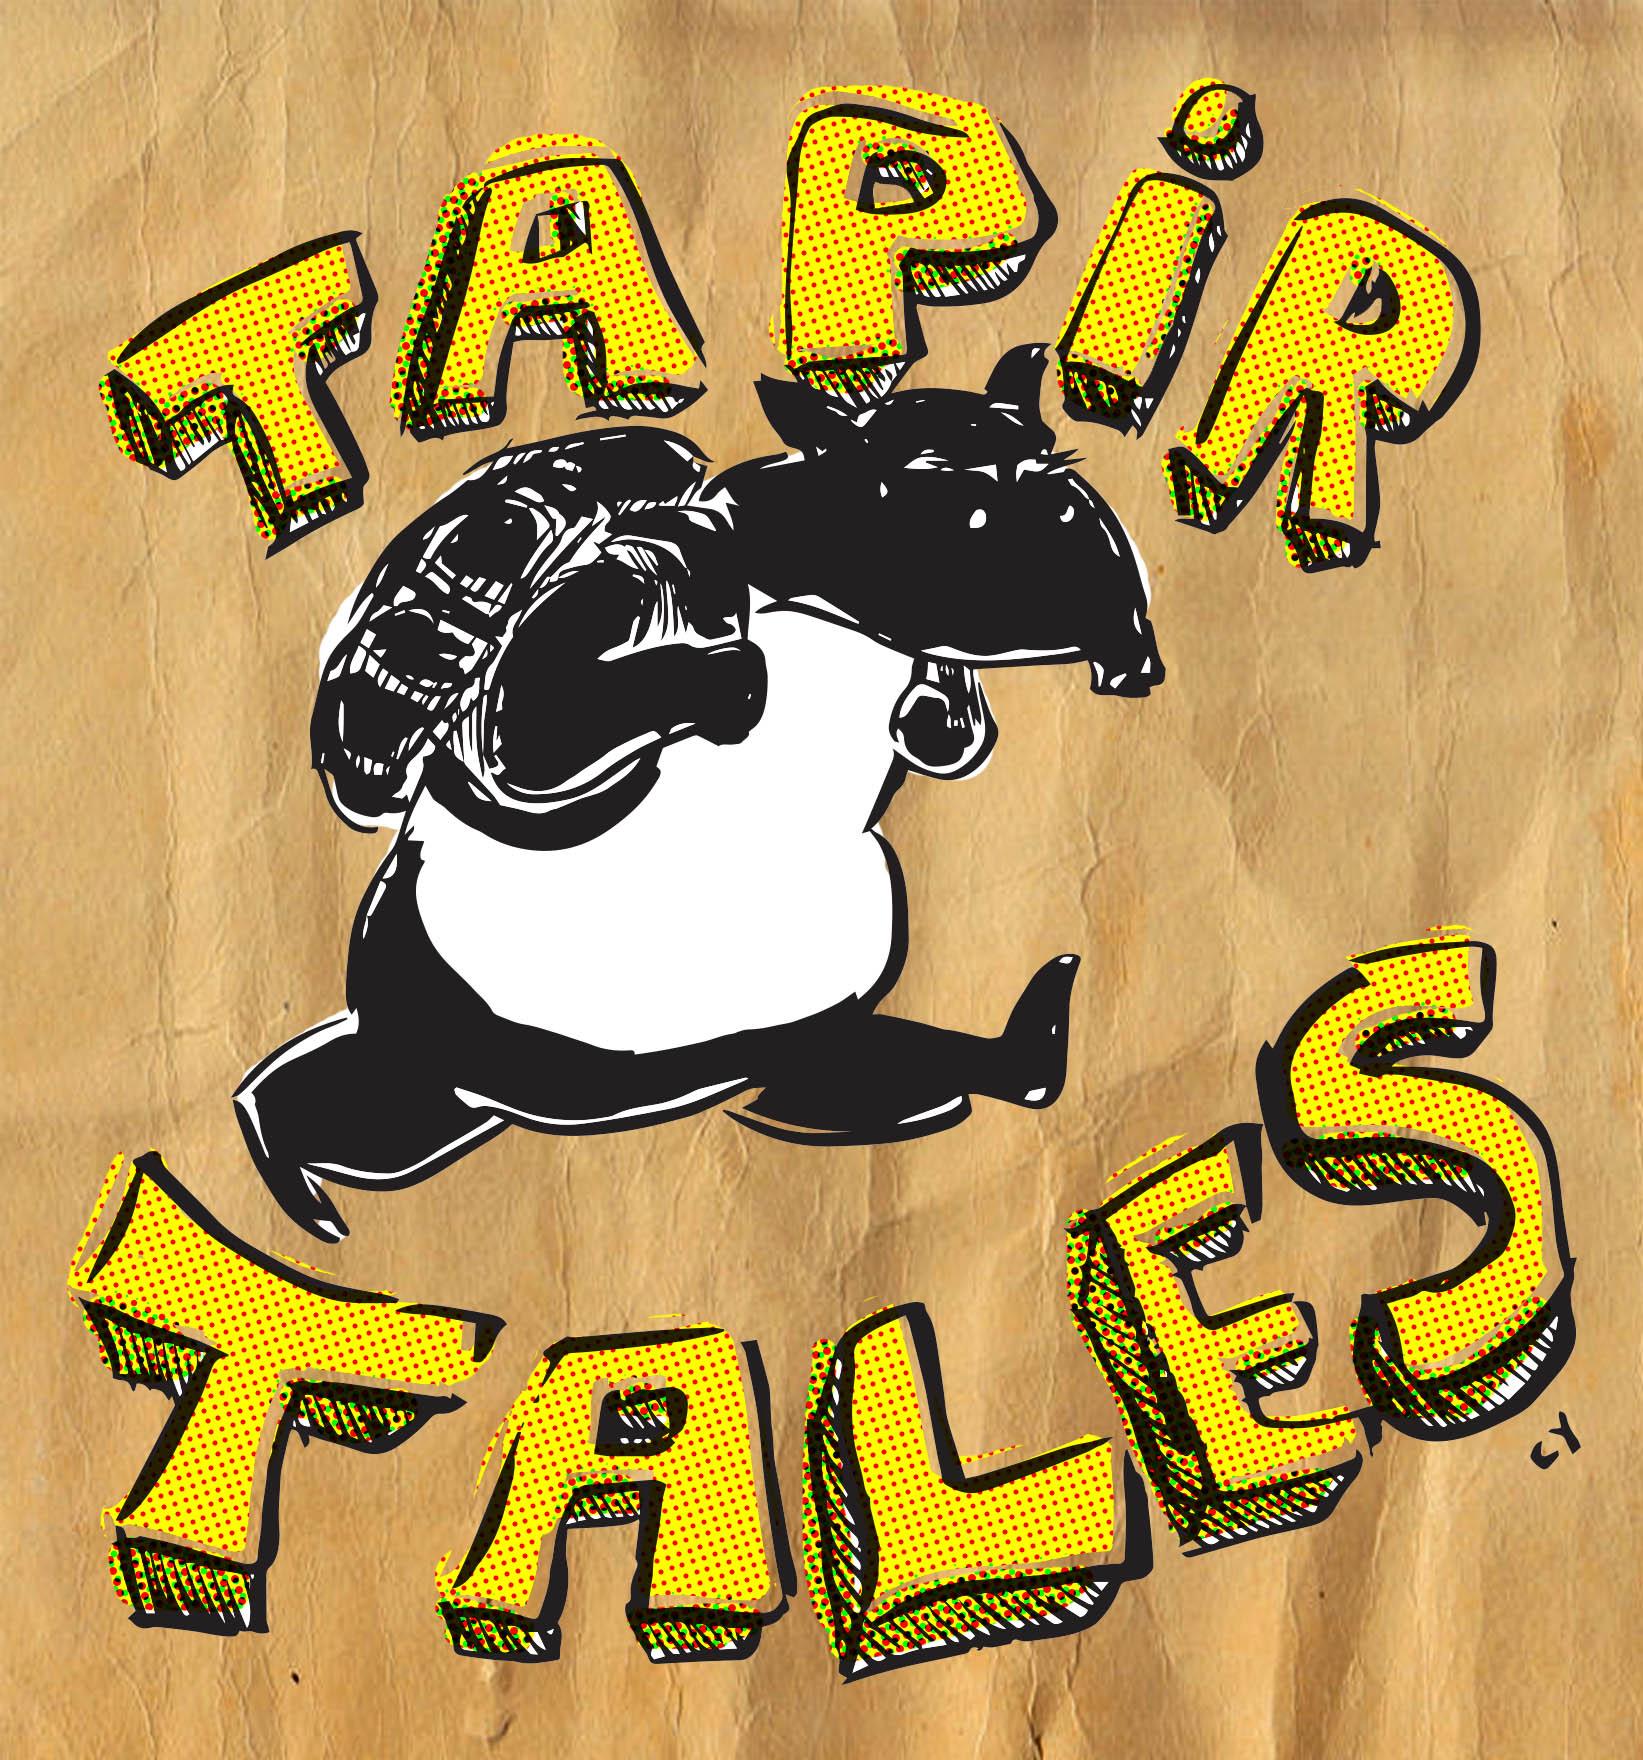 TAPIR TALES